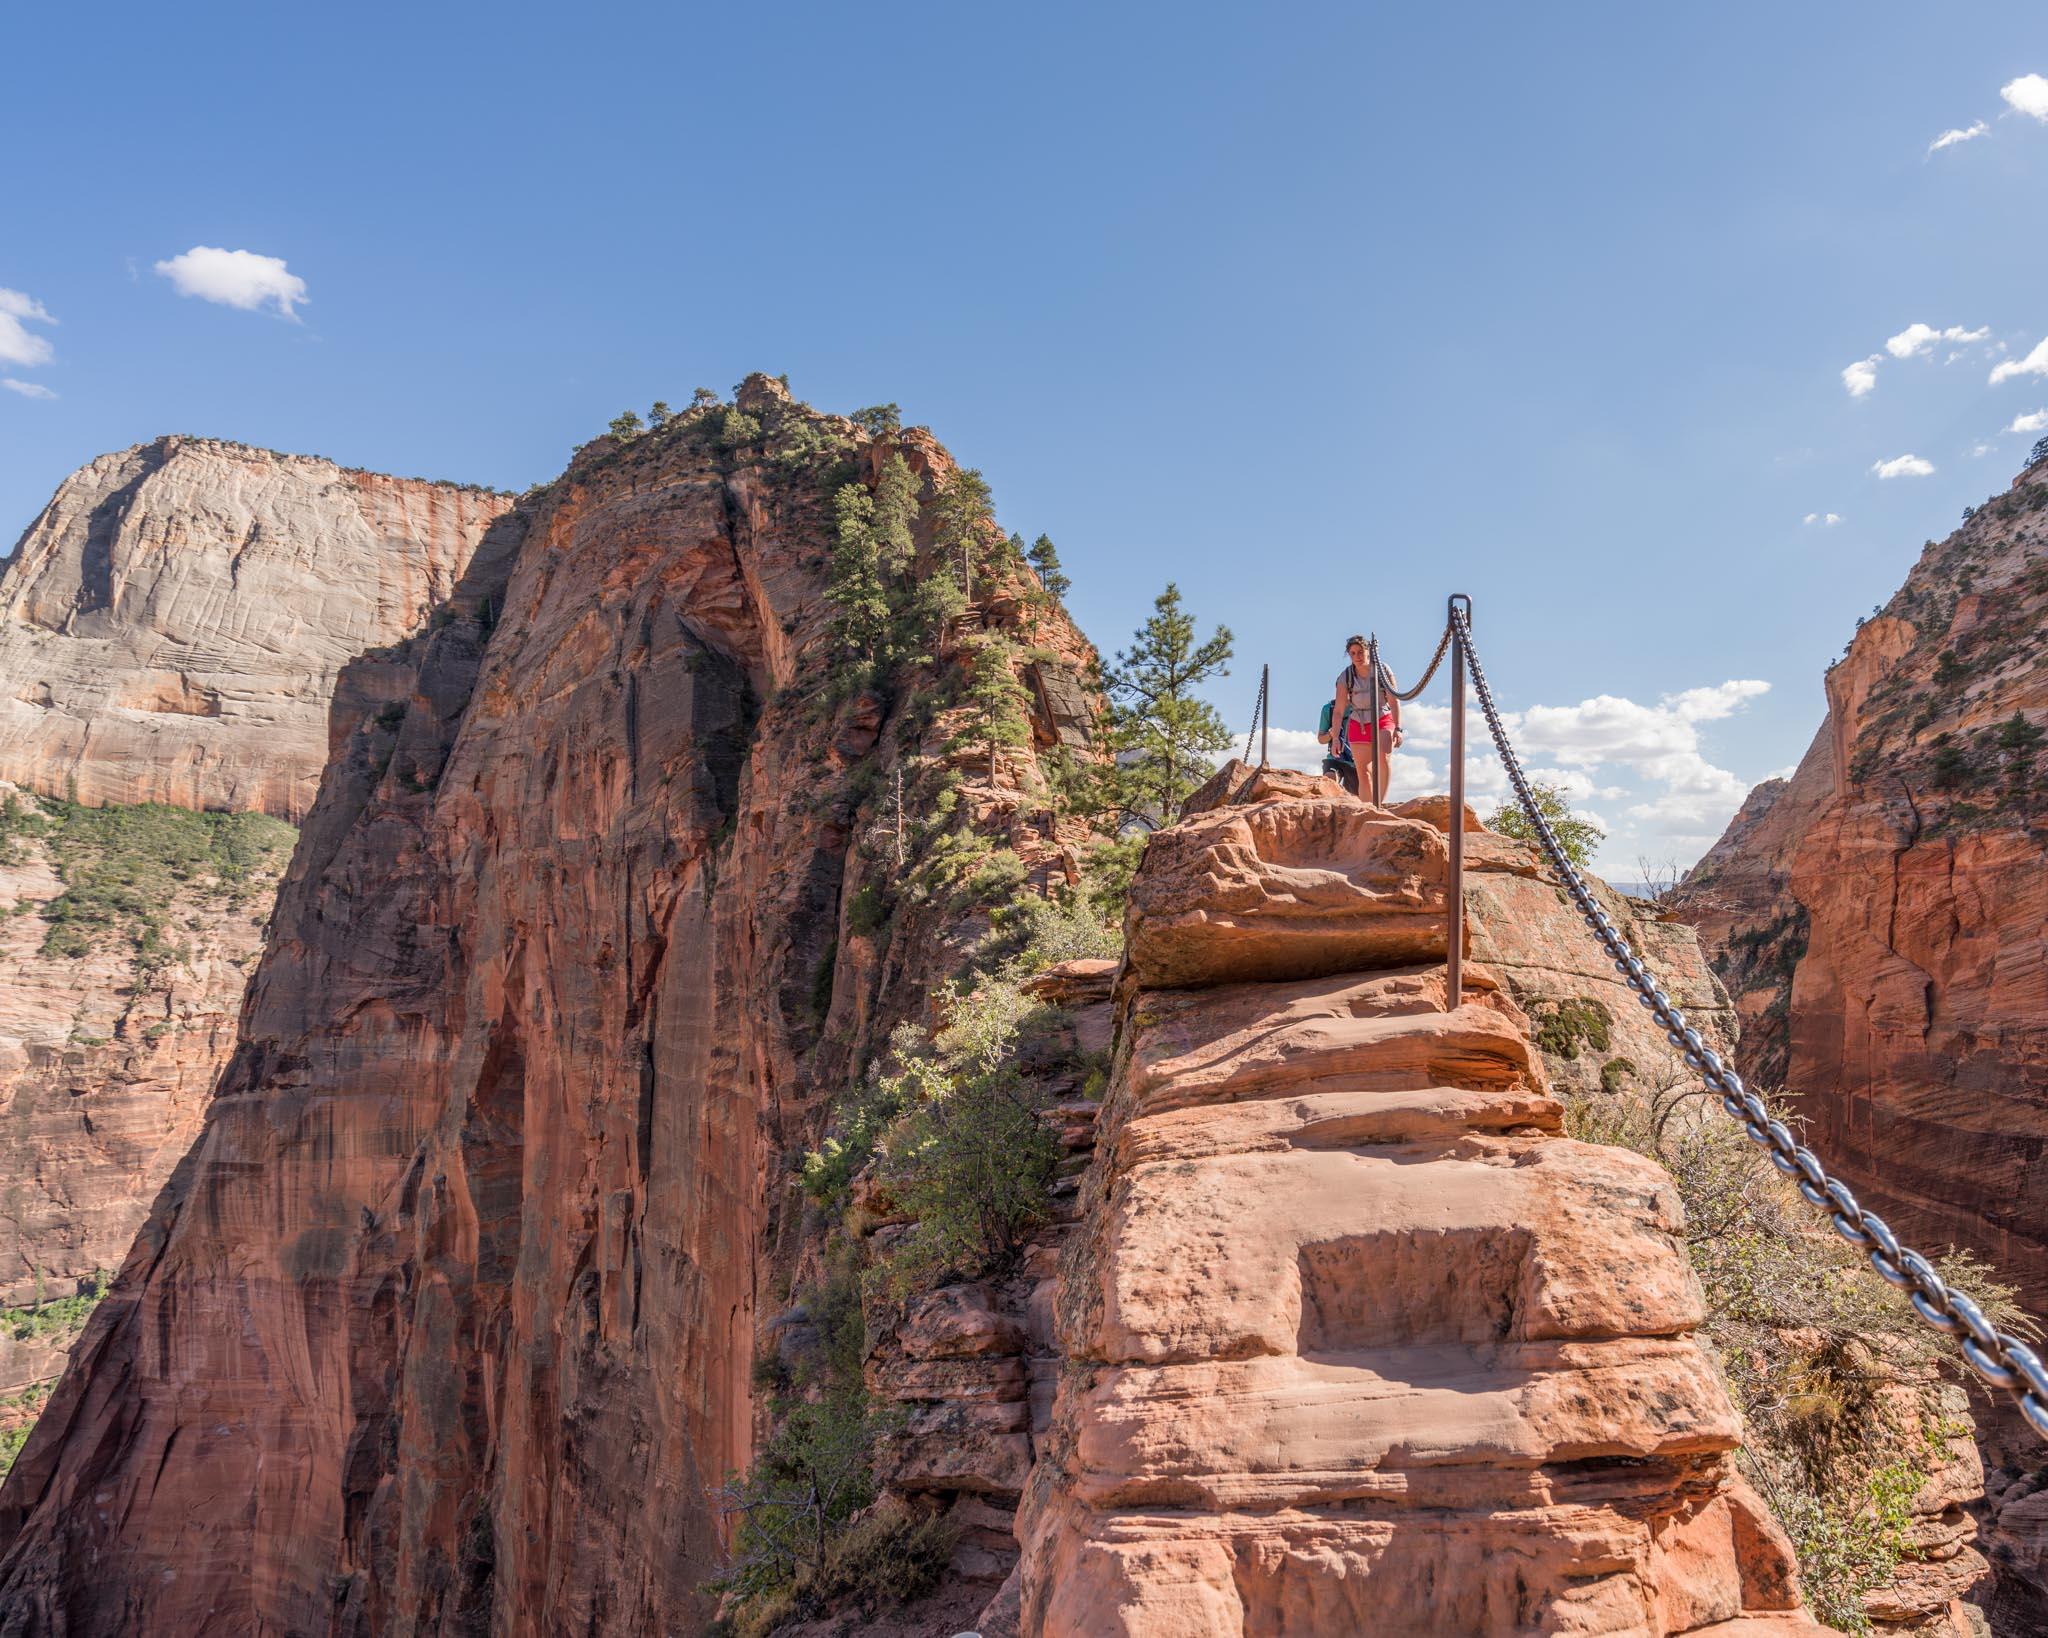 Angels Landing Zion Canyon - canyon-trails.de